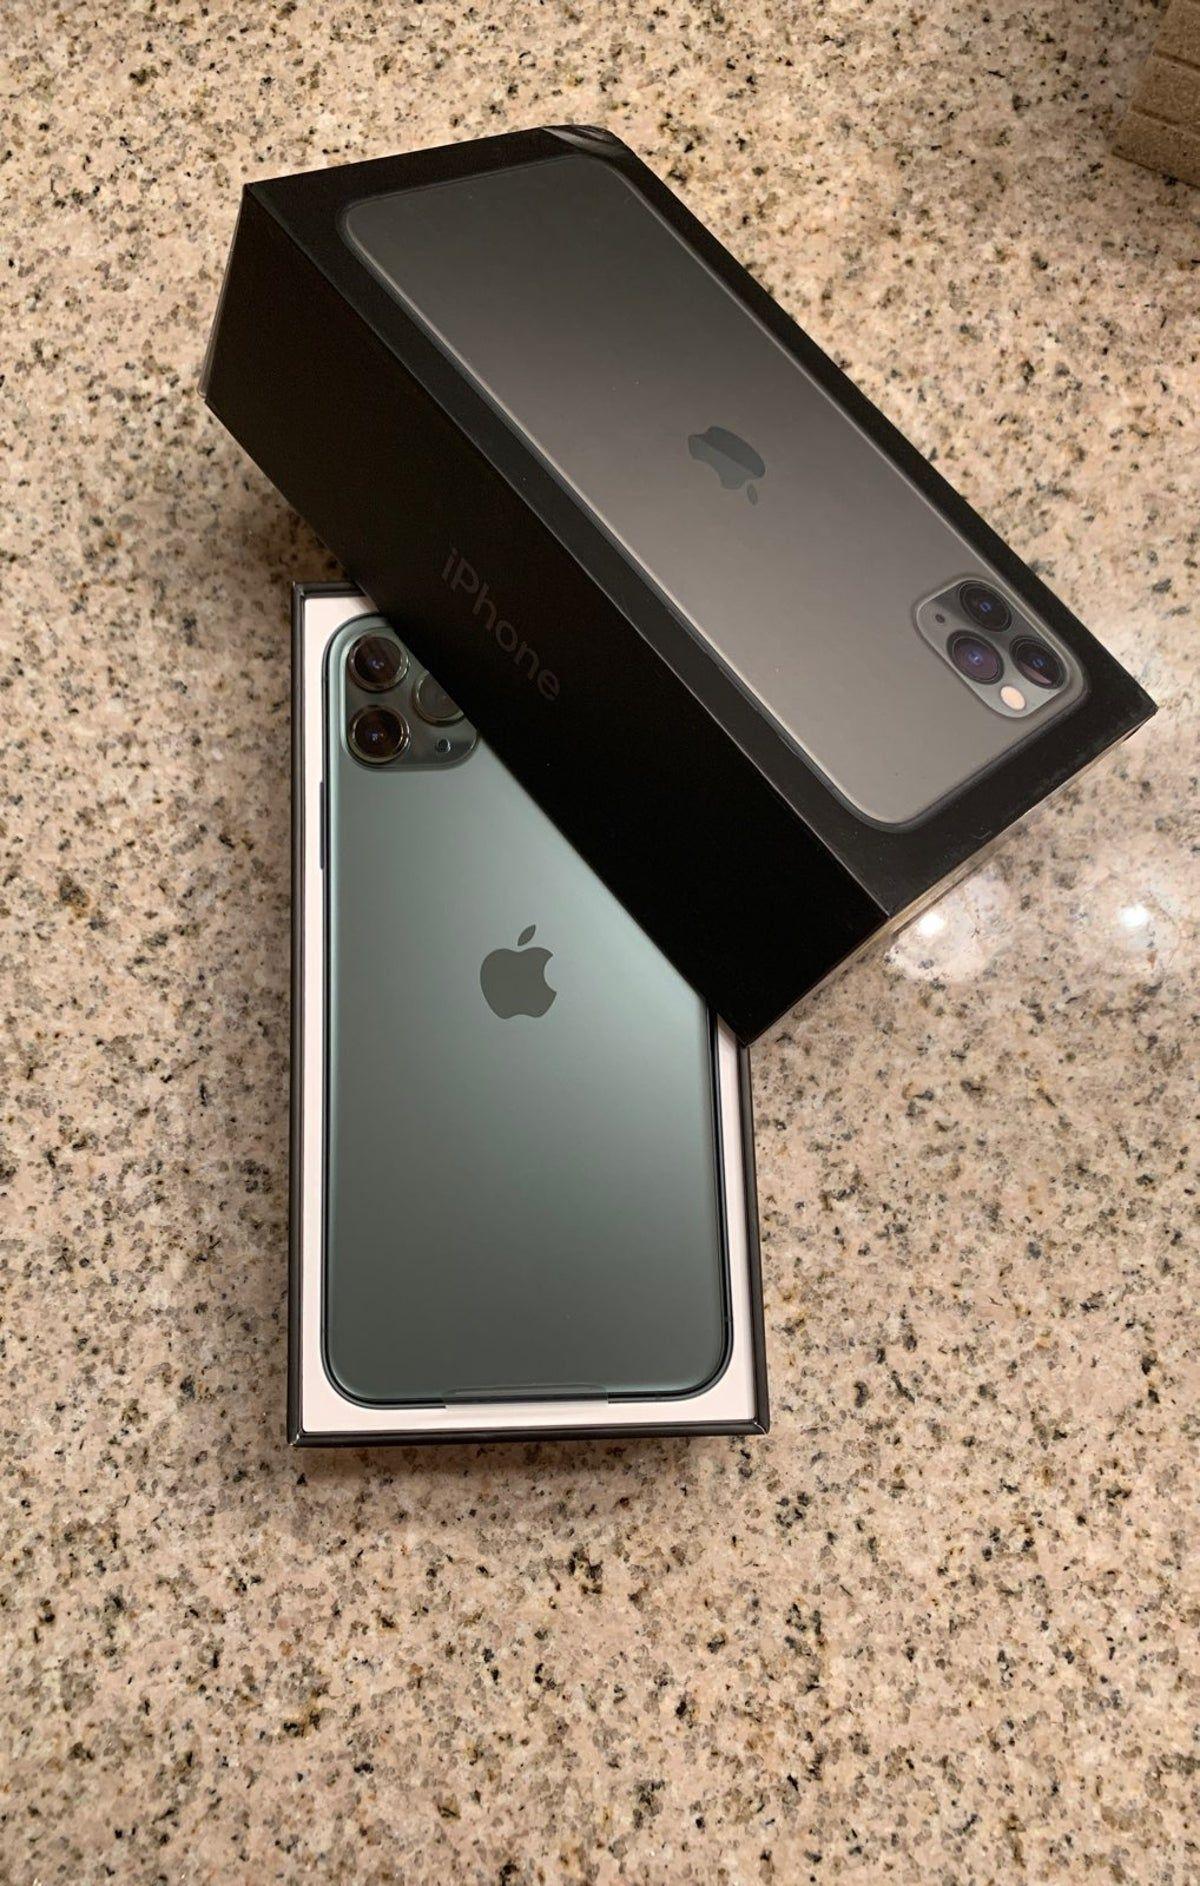 Iphone 11 Pro Max Midnight Green 256gb Iphone 11 Pro Max Midnight Green Apple Iphone Accessories Iphone